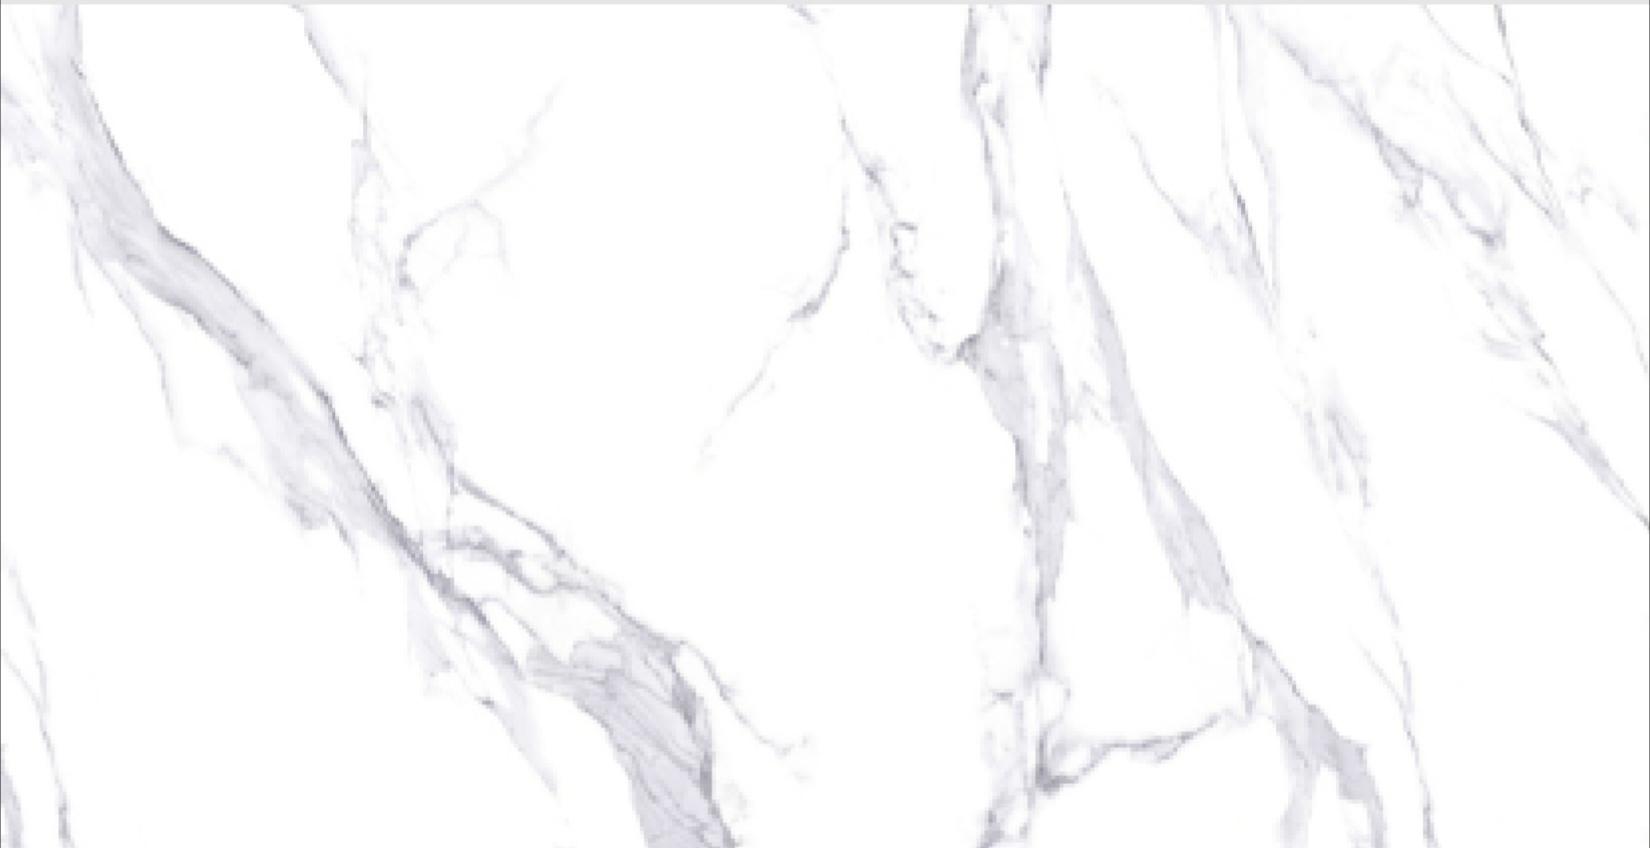 Sintered Stone Big Porcelain Slab Glazed Tiles For Countertops Surface